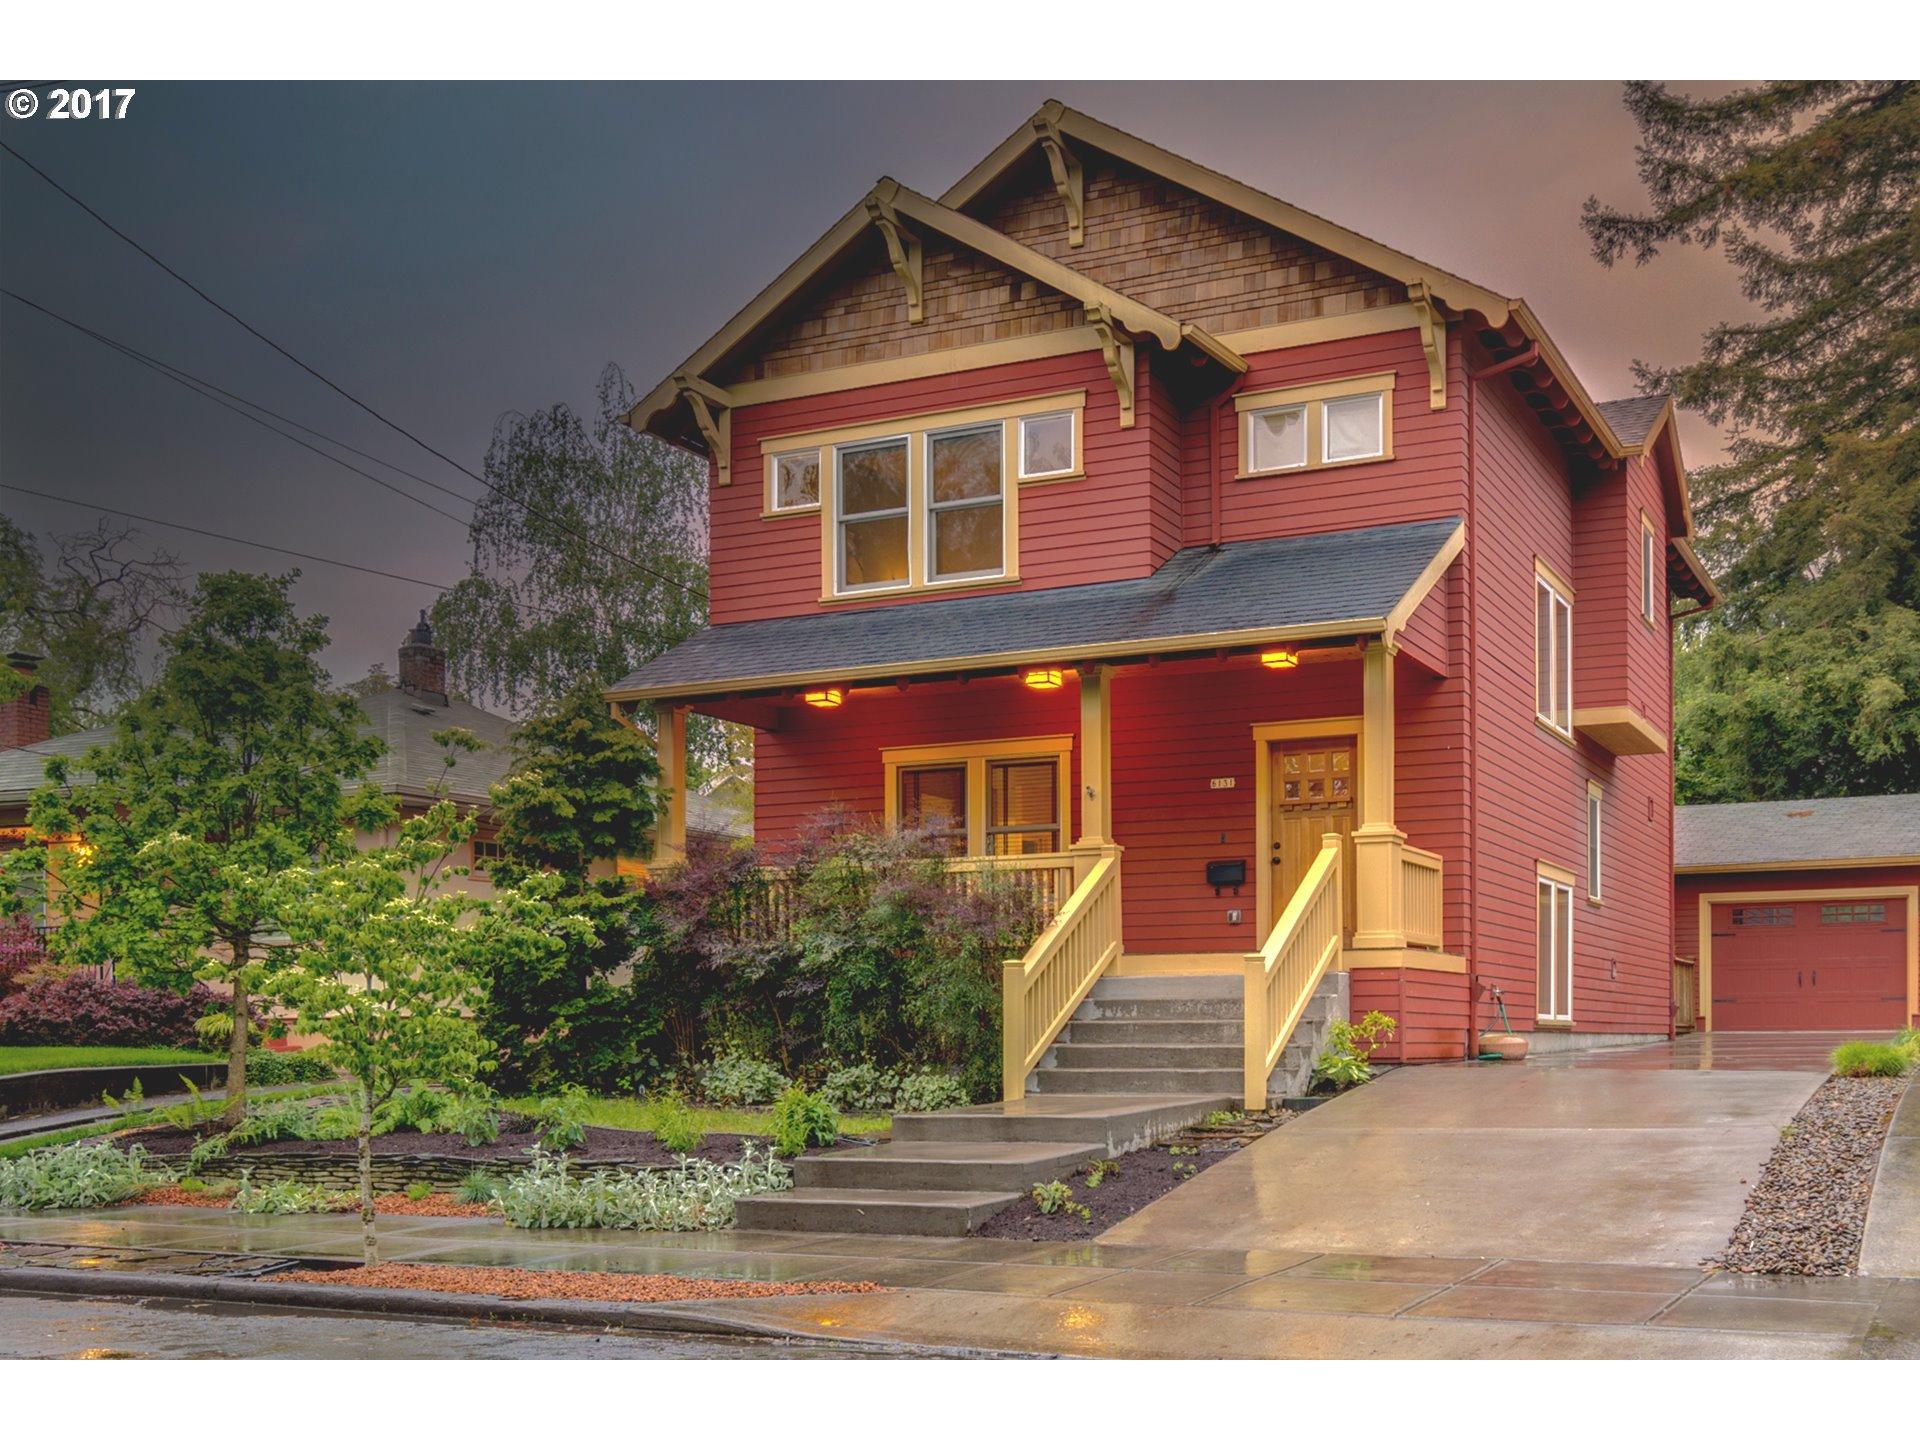 6131 SE 18TH AVE, Portland, OR 97202